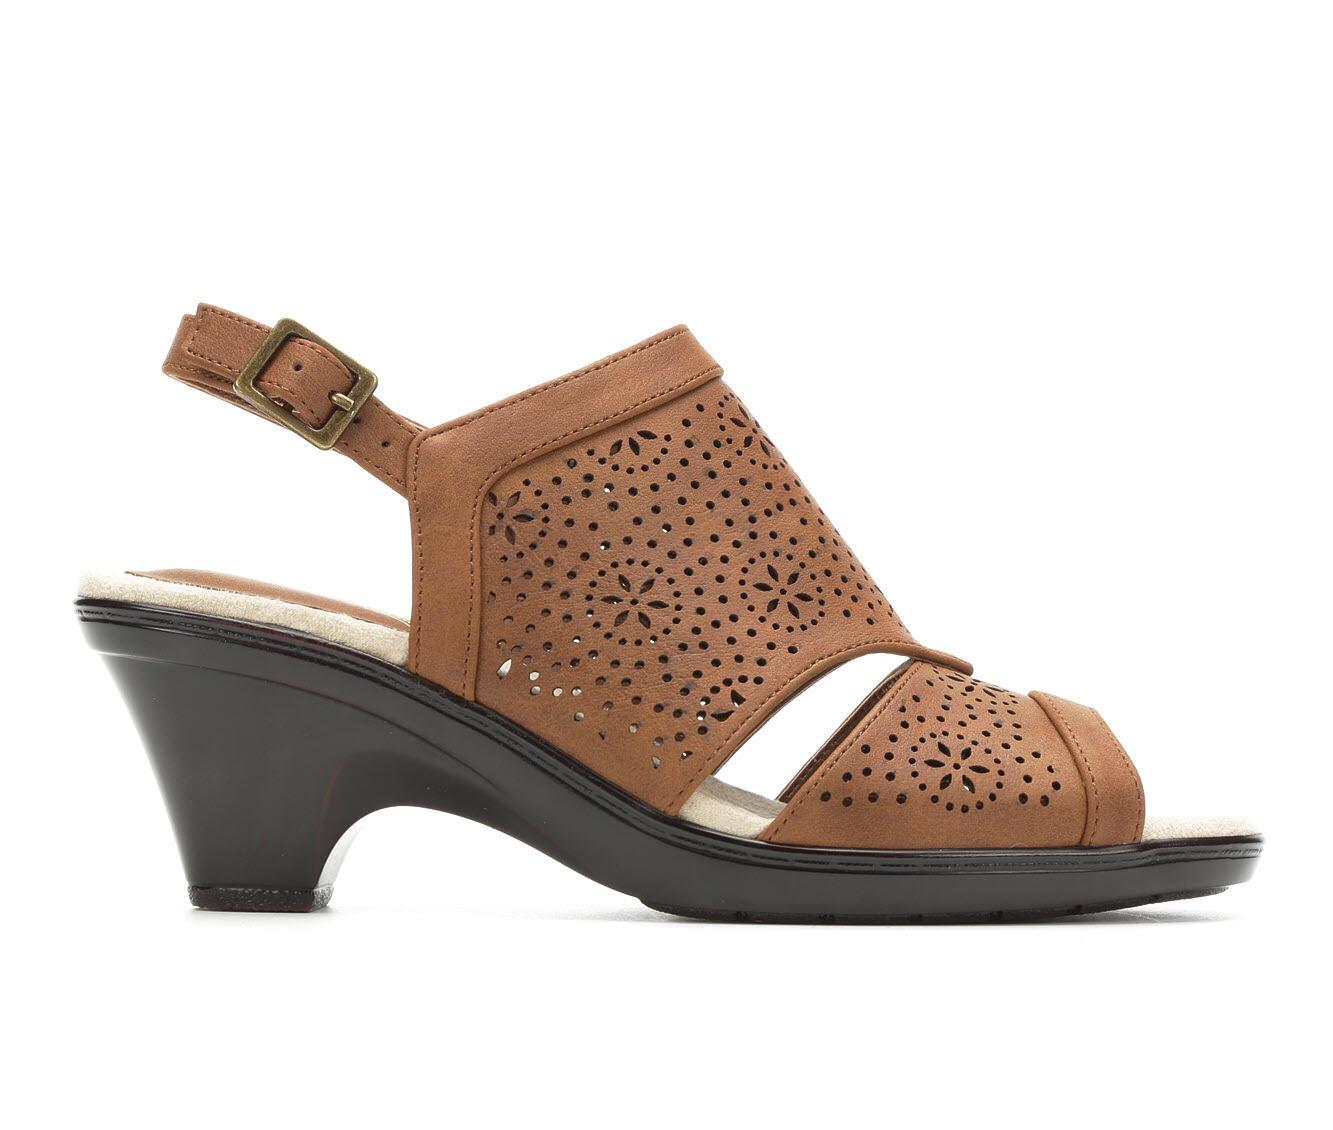 New Style Women's Easy Street Linda Heeled Sandals Tan